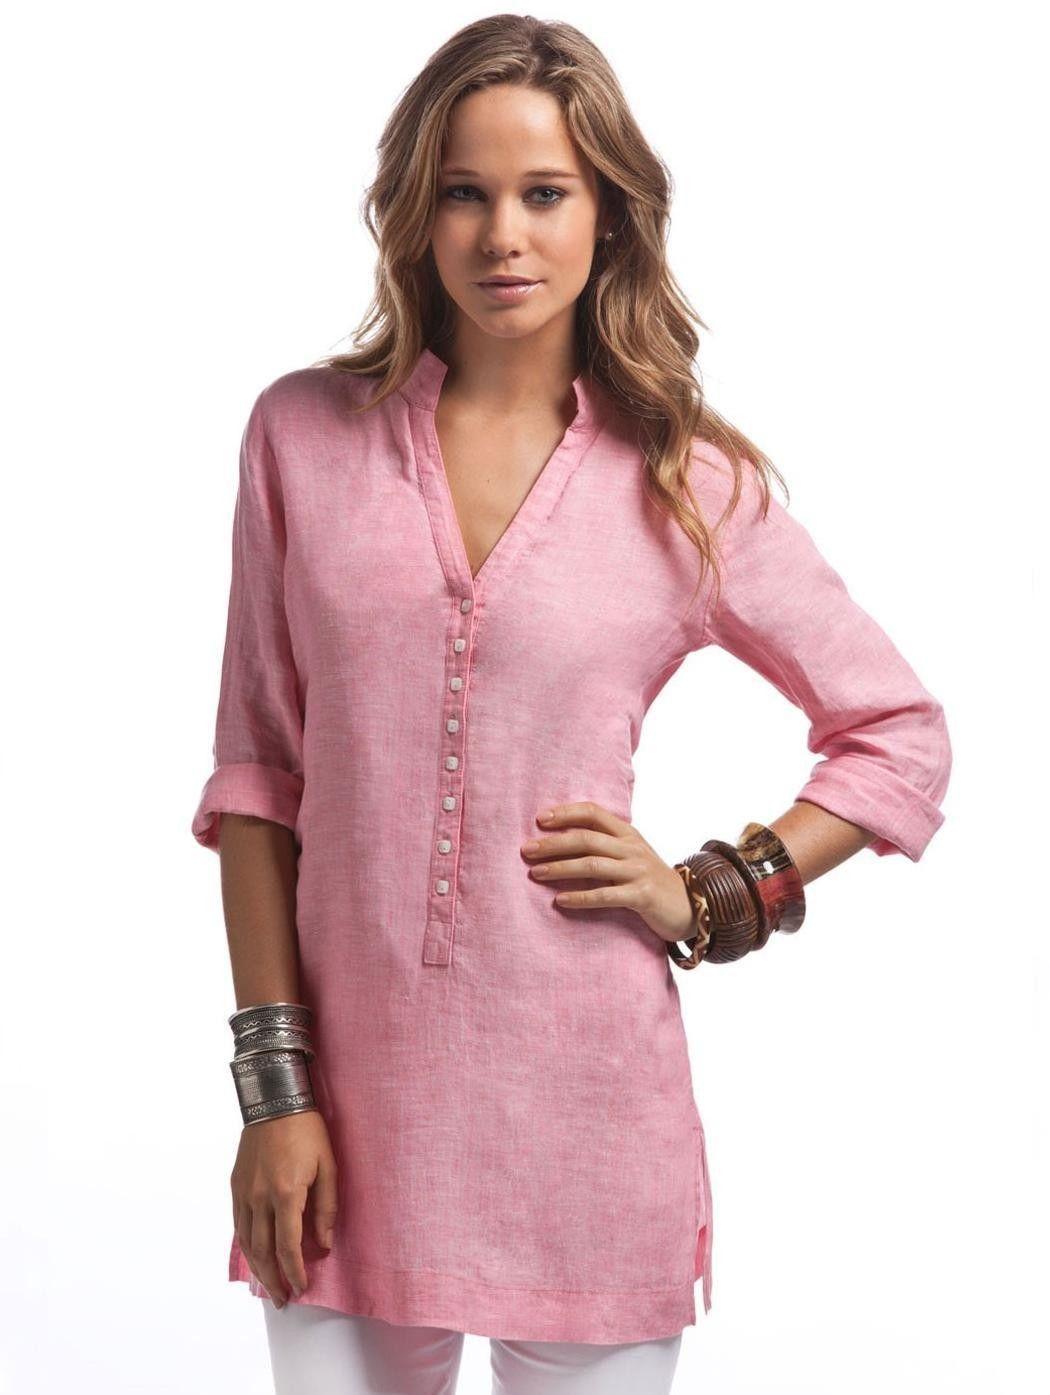 e05ed5e282 Raspberry Linen Kimono Shirt - Womens Pink Linen Tunic |Island Company  Women's linen tunic. Relaxed fit with straight cut. Bell sleeves. Side  slits.